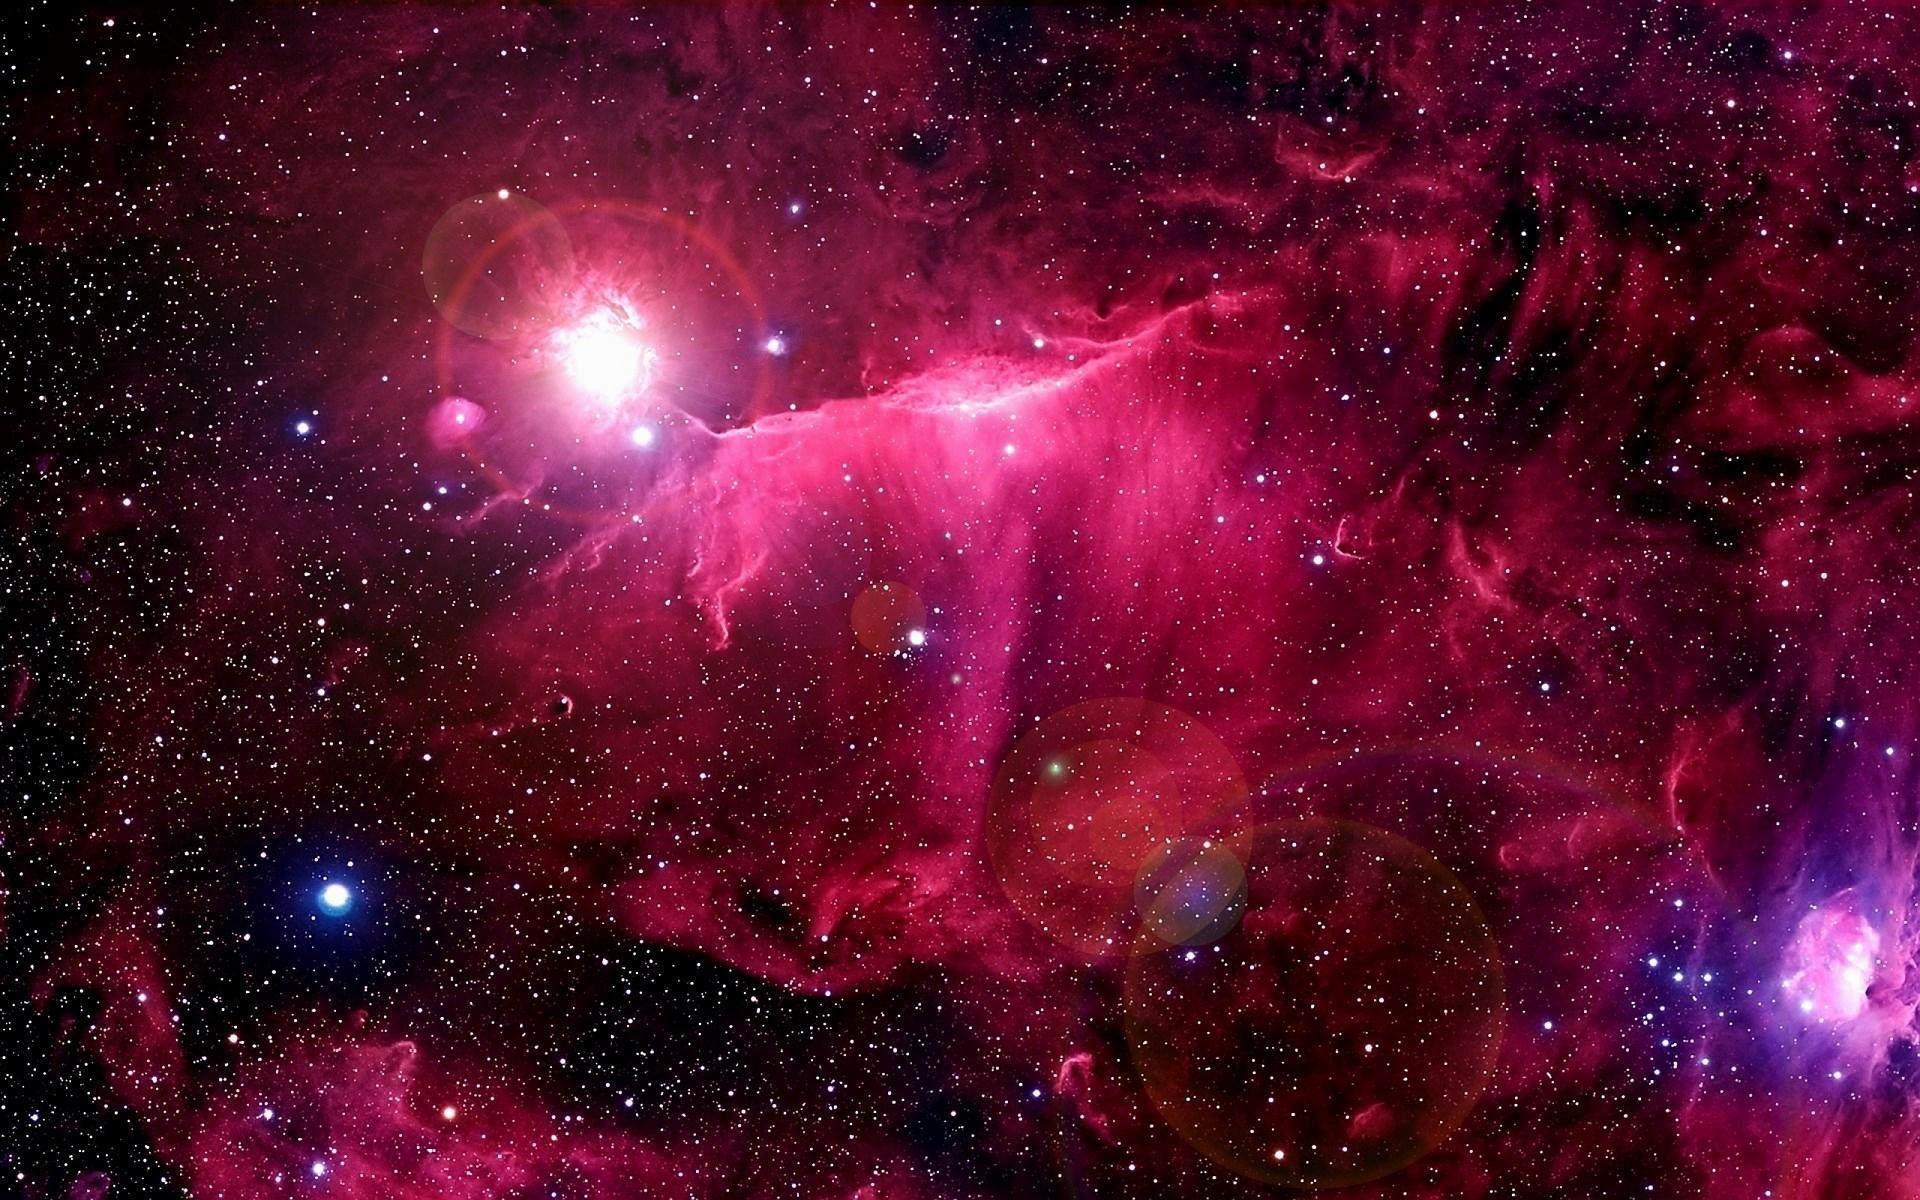 galaxy-pack-1080p-hd-wallpaper-wp2005383